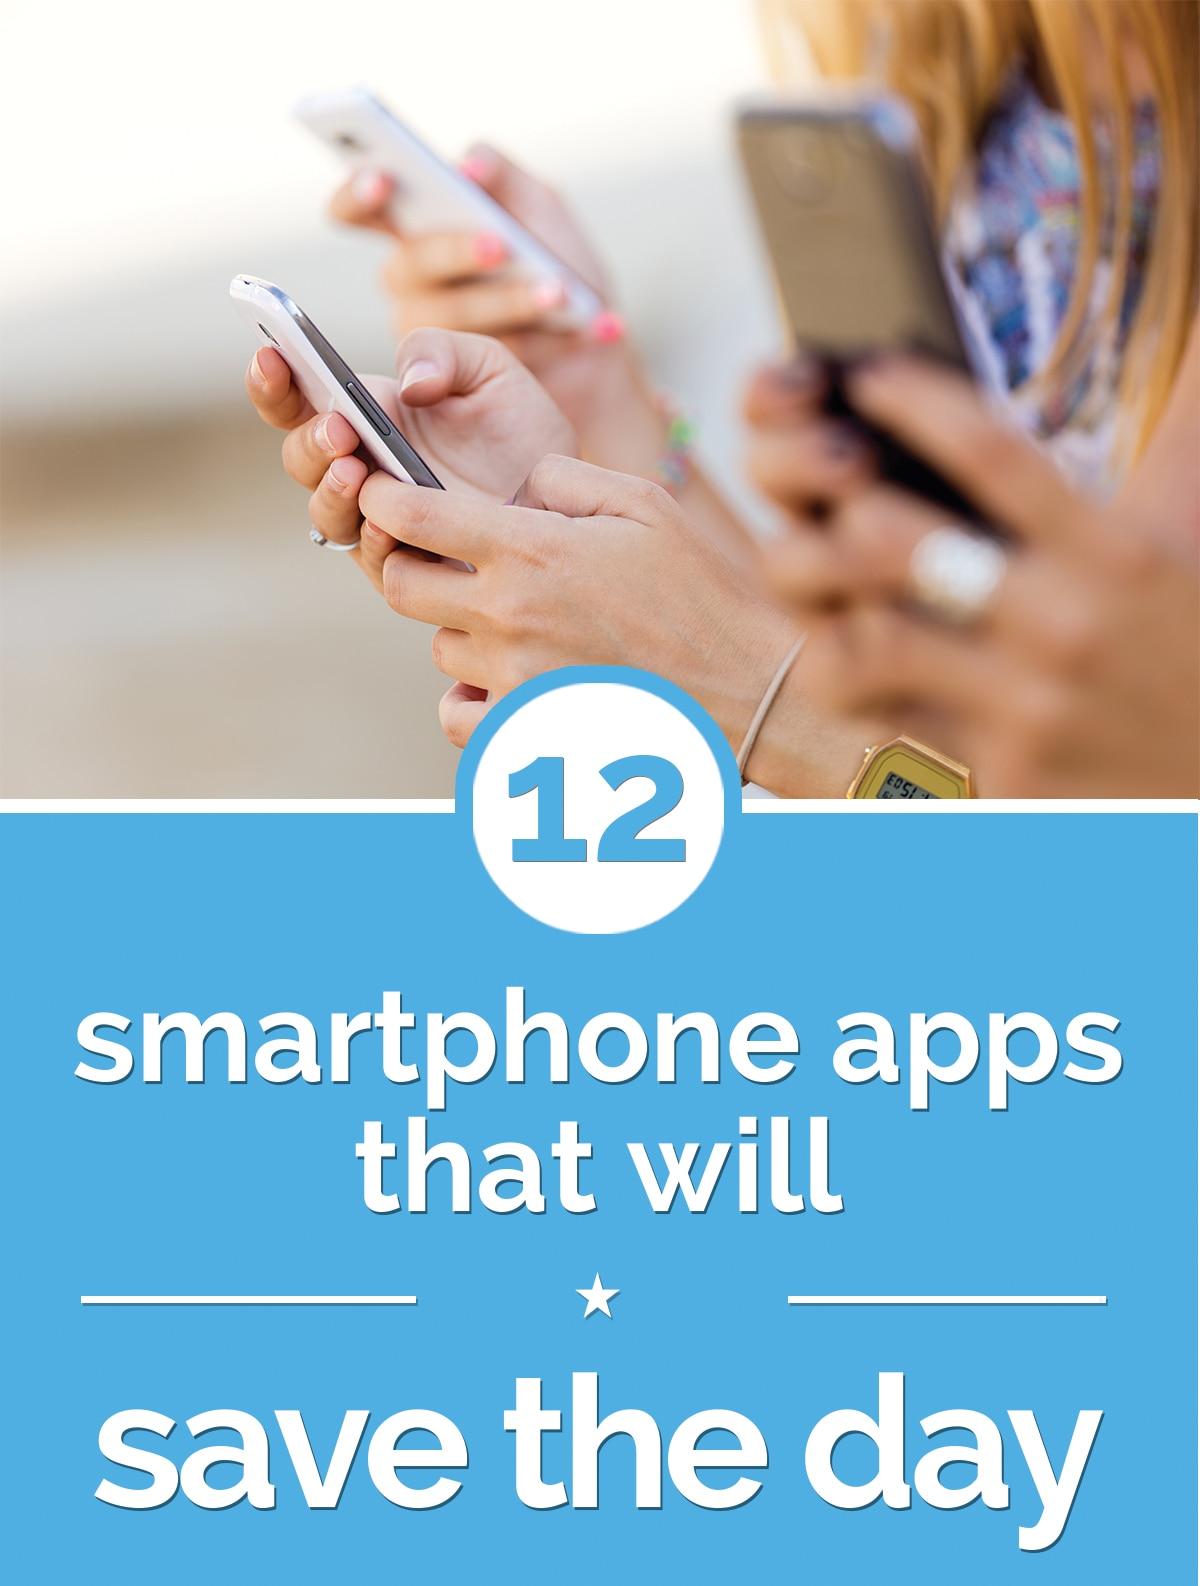 verizon-smartphone-apps